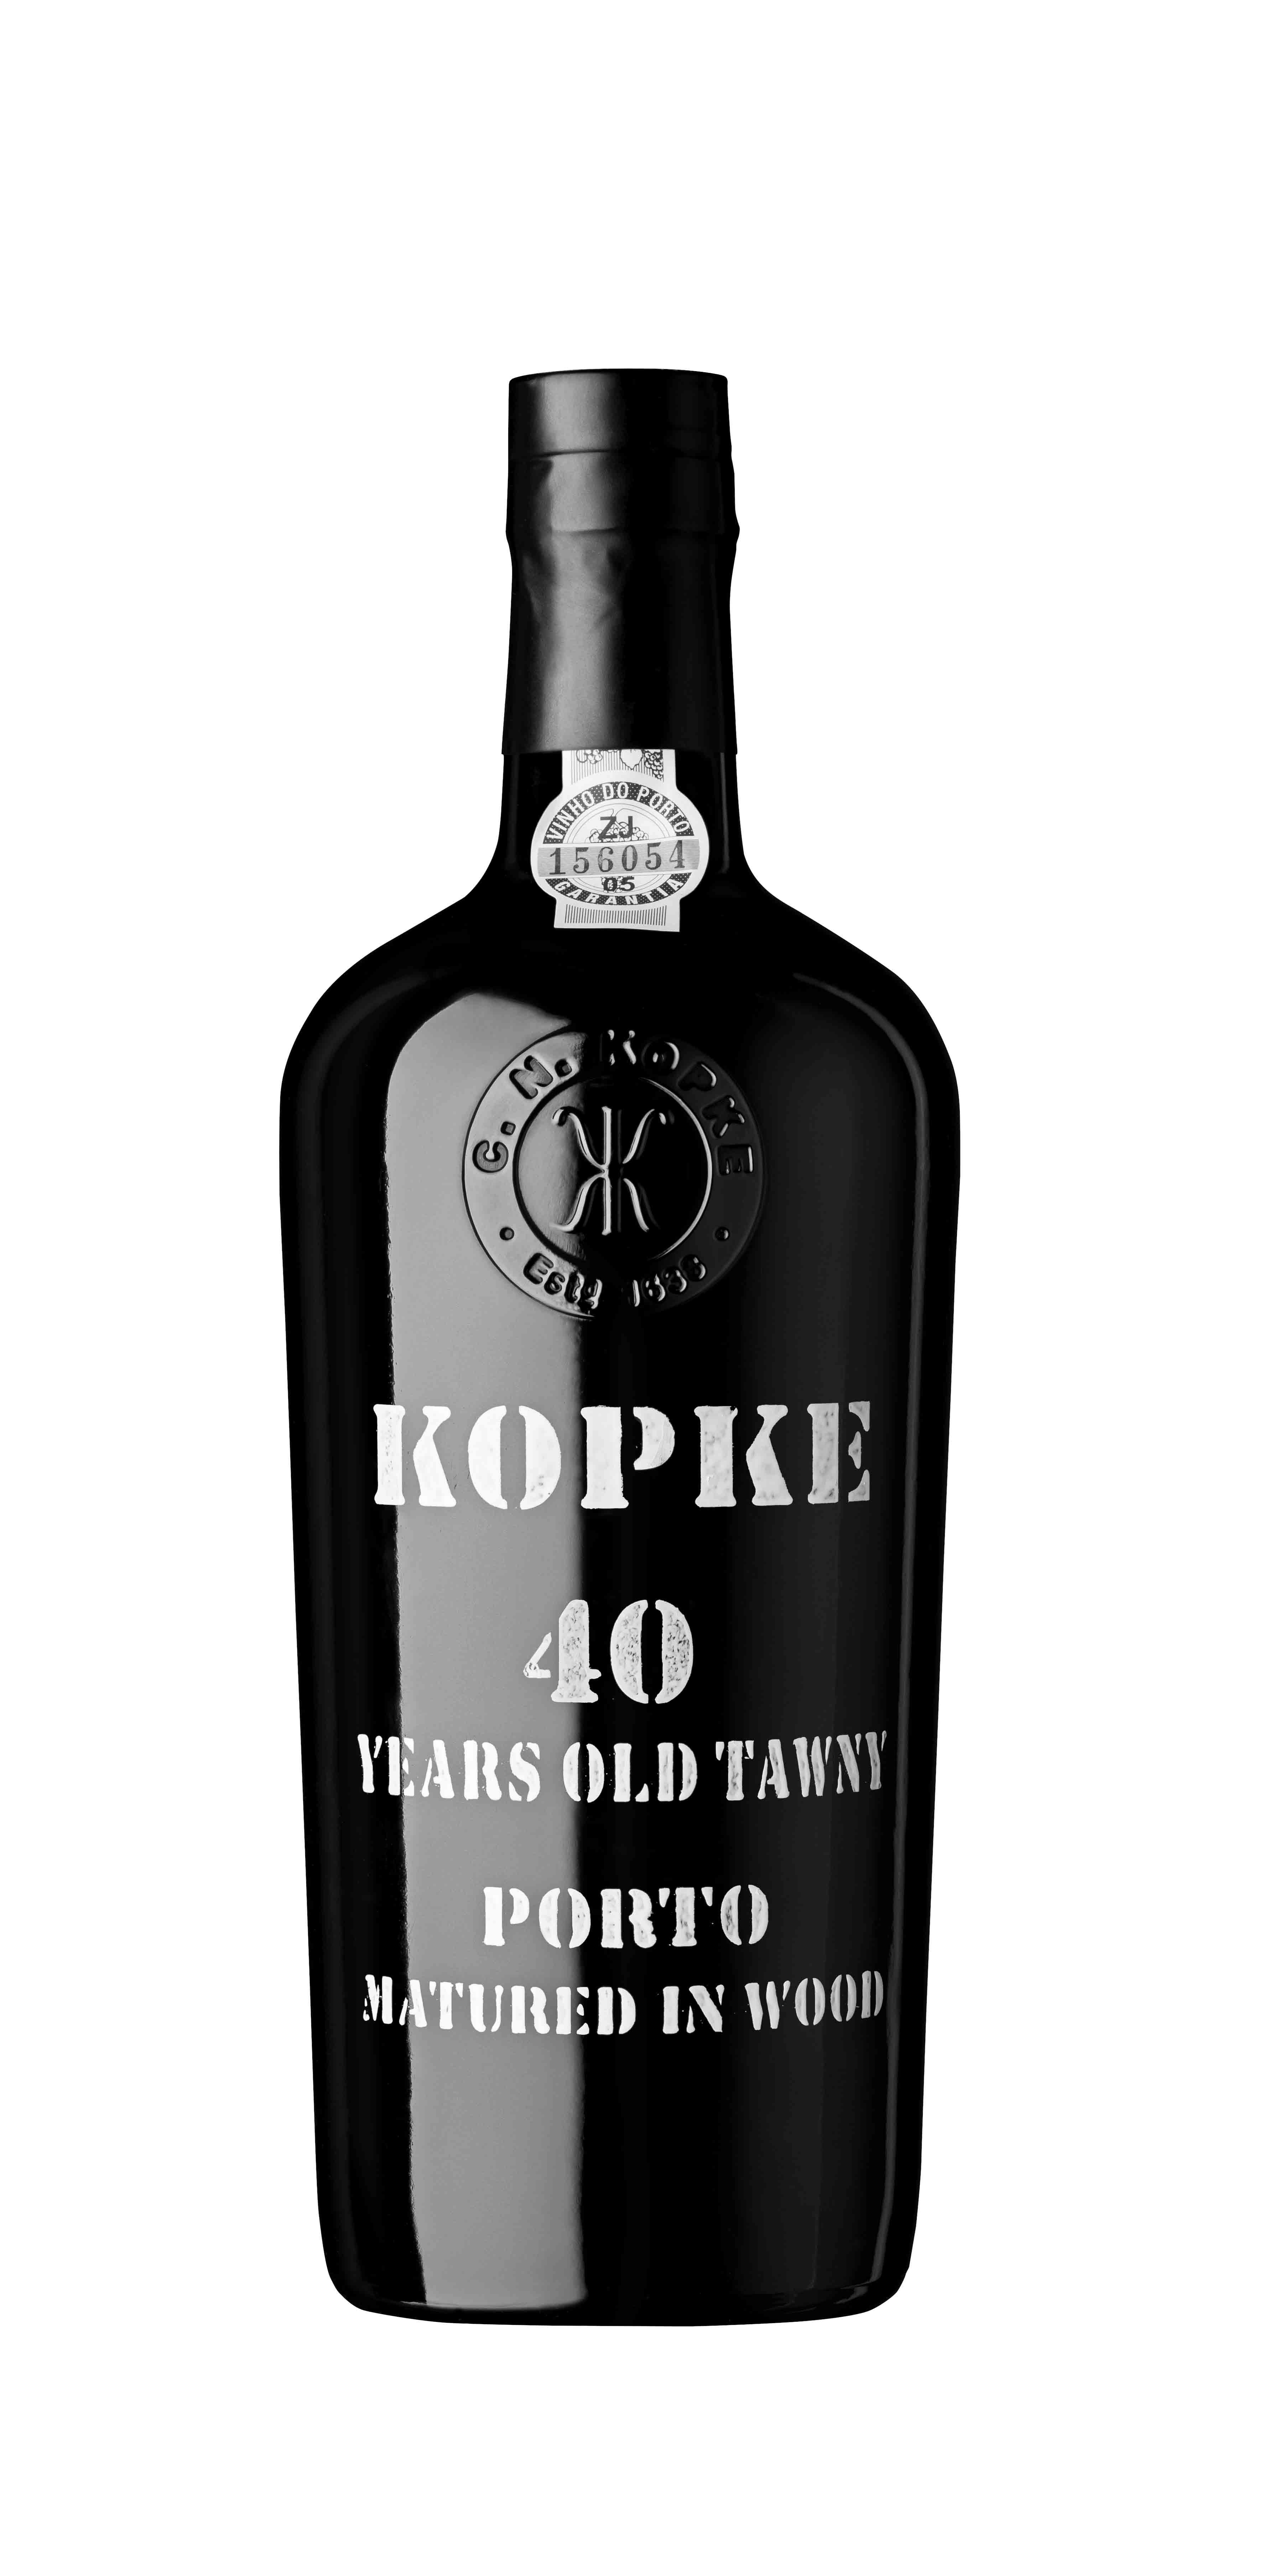 Kopke 40 Year Old Tawny Port